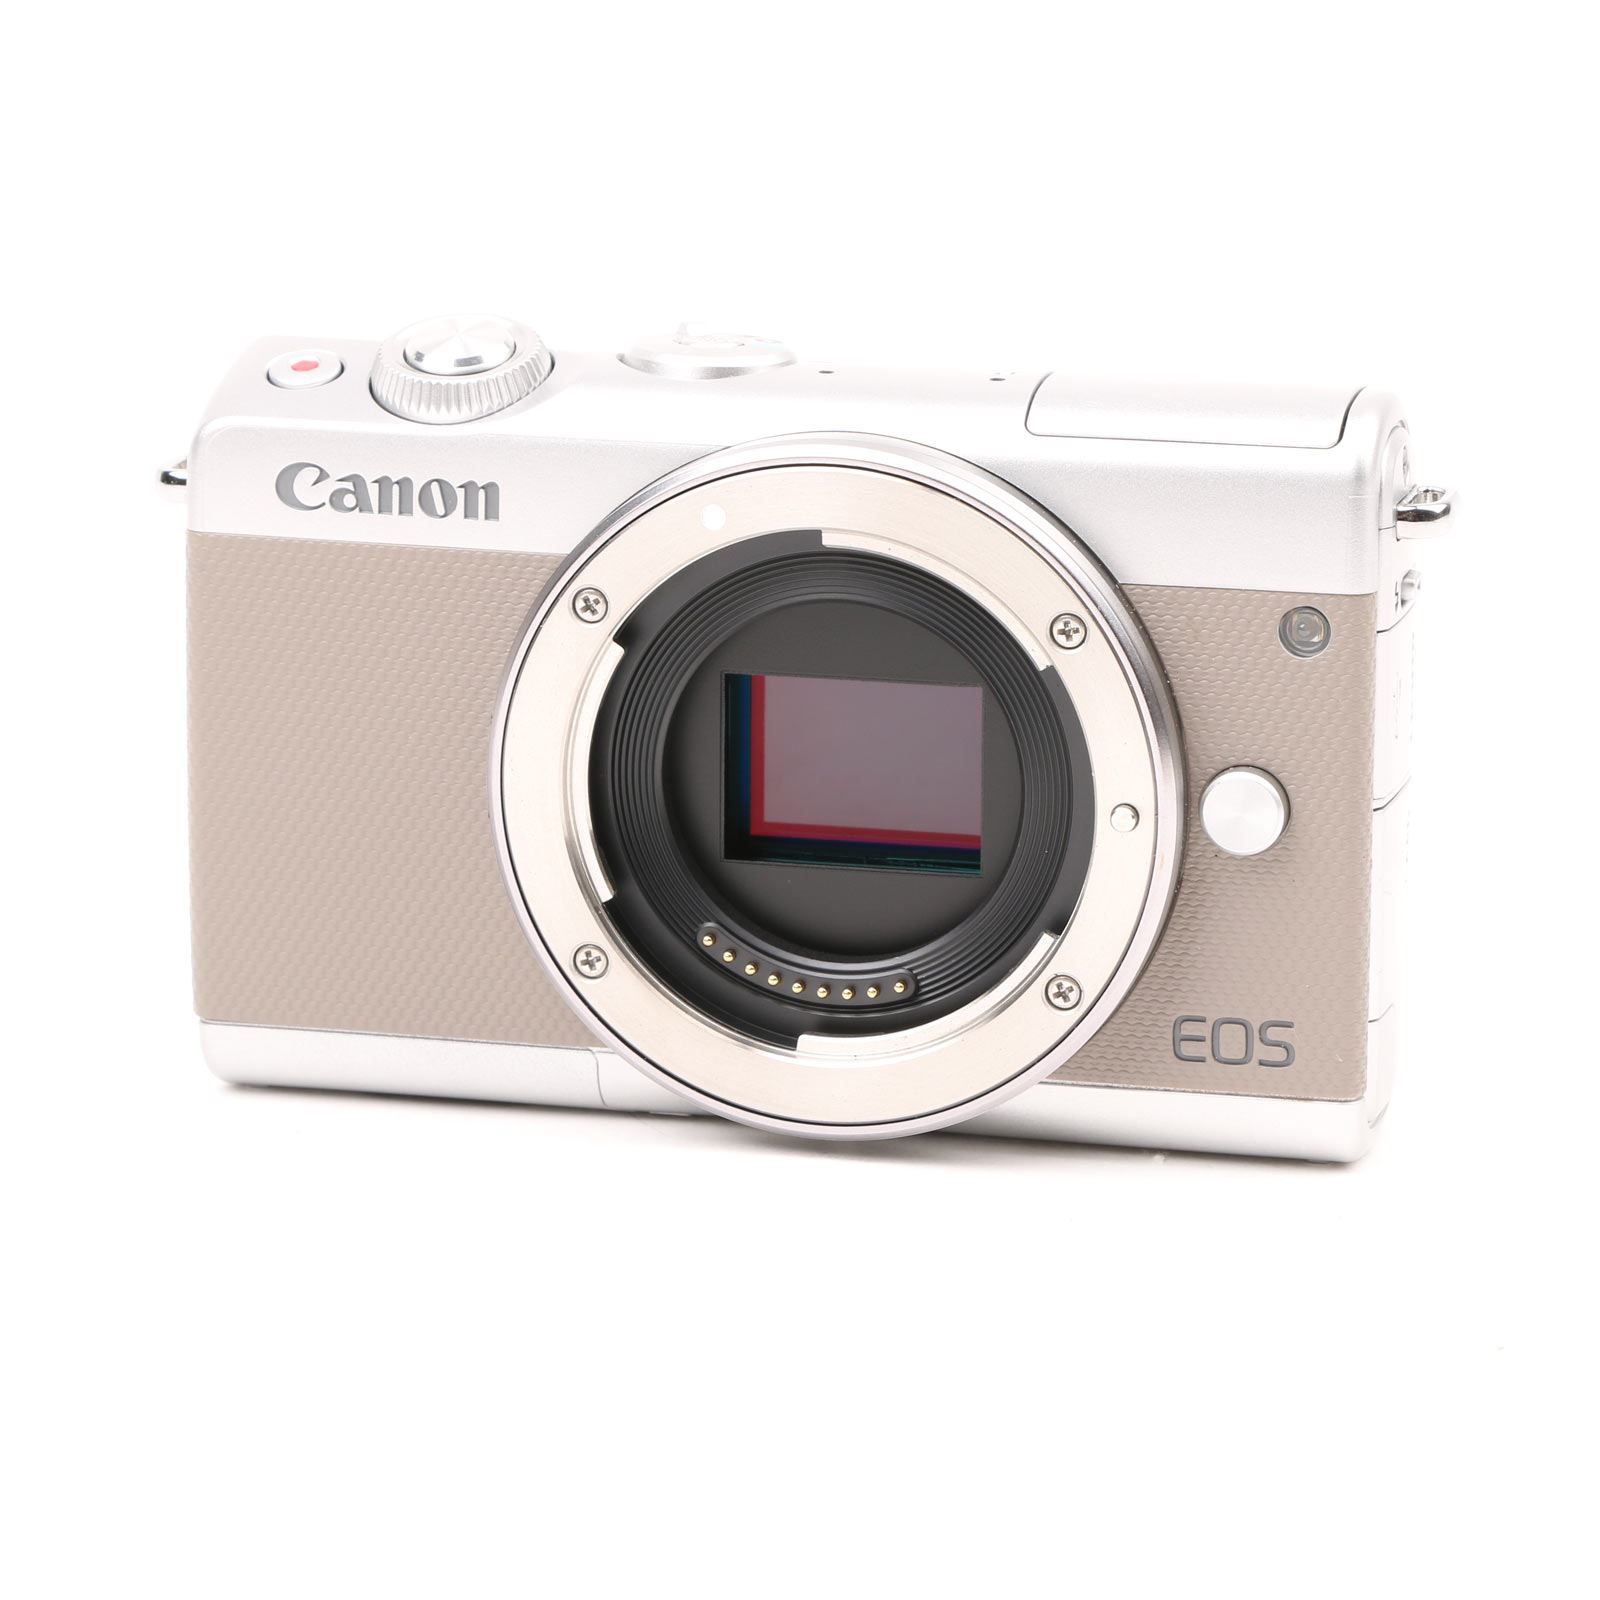 Image of Used Canon EOS M100 Digital Camera Body Silver